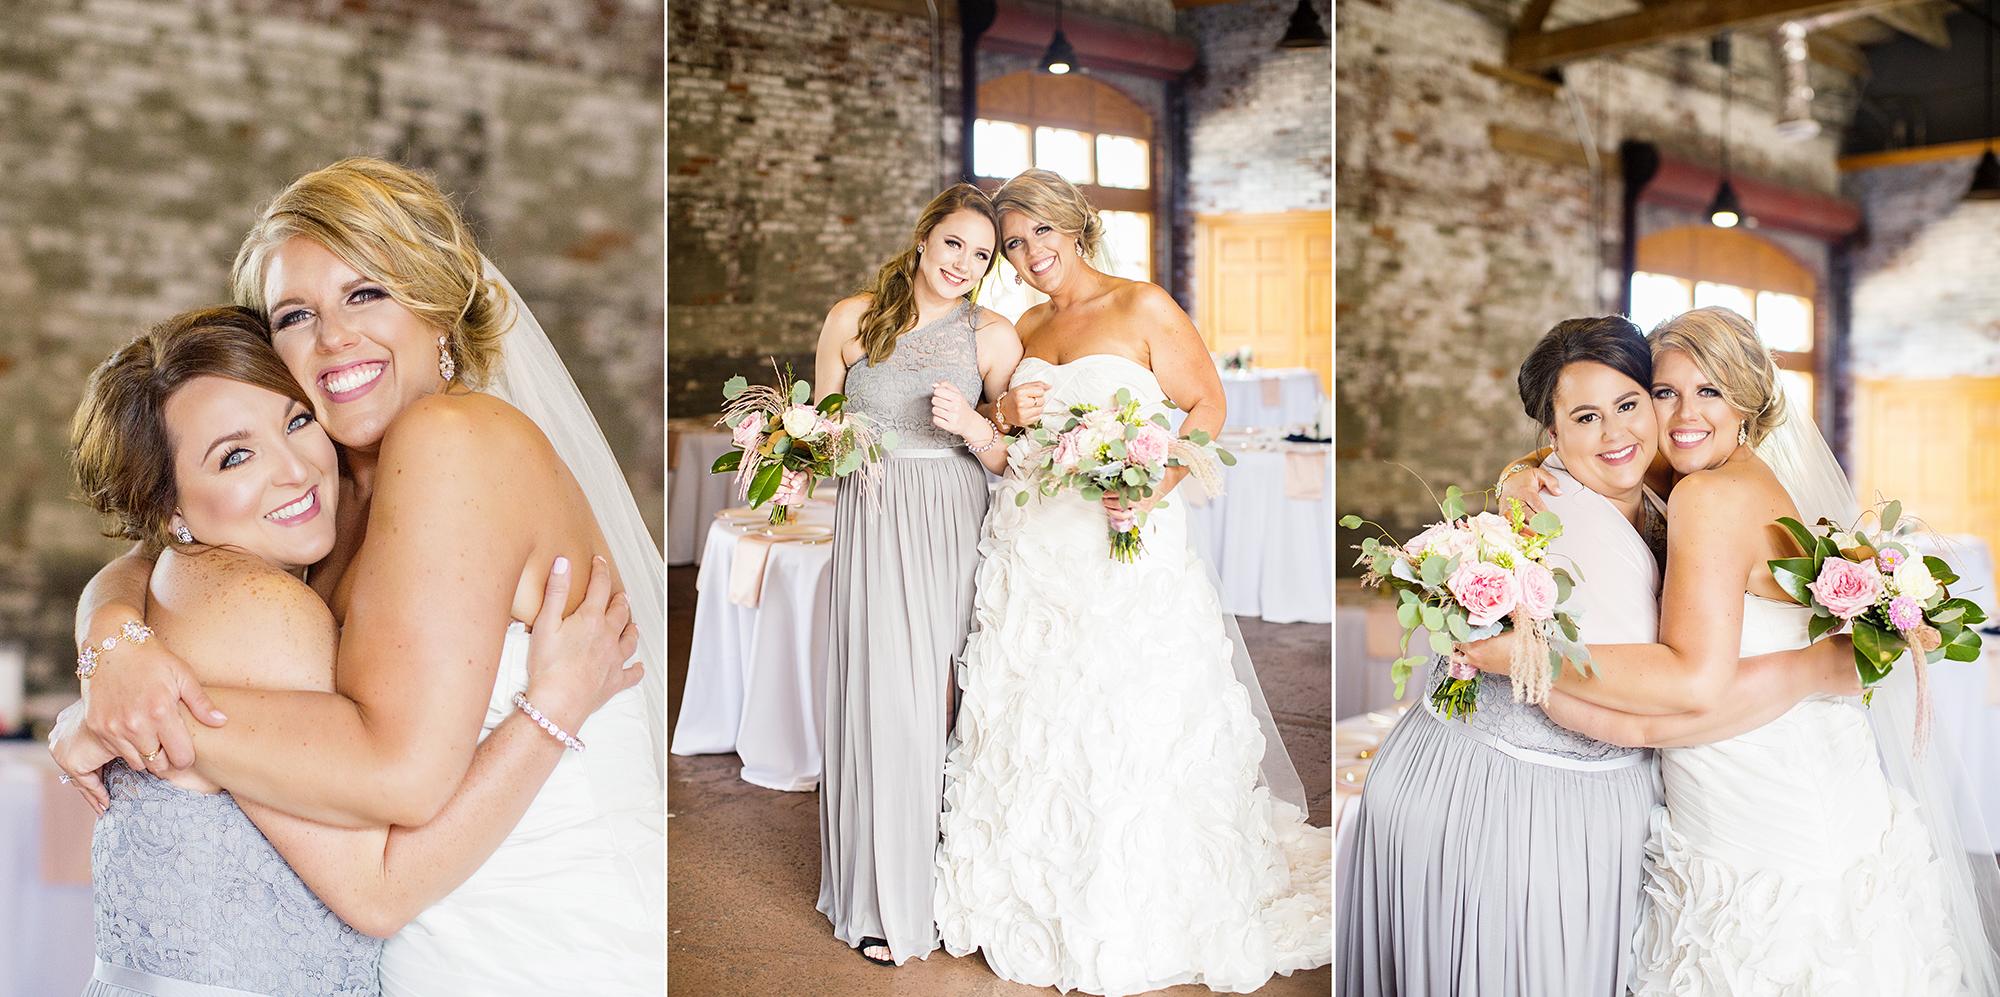 Seriously_Sabrina_Photography_Ashland_Kentucky_Train_Depot_Wedding_Parsons18.jpg